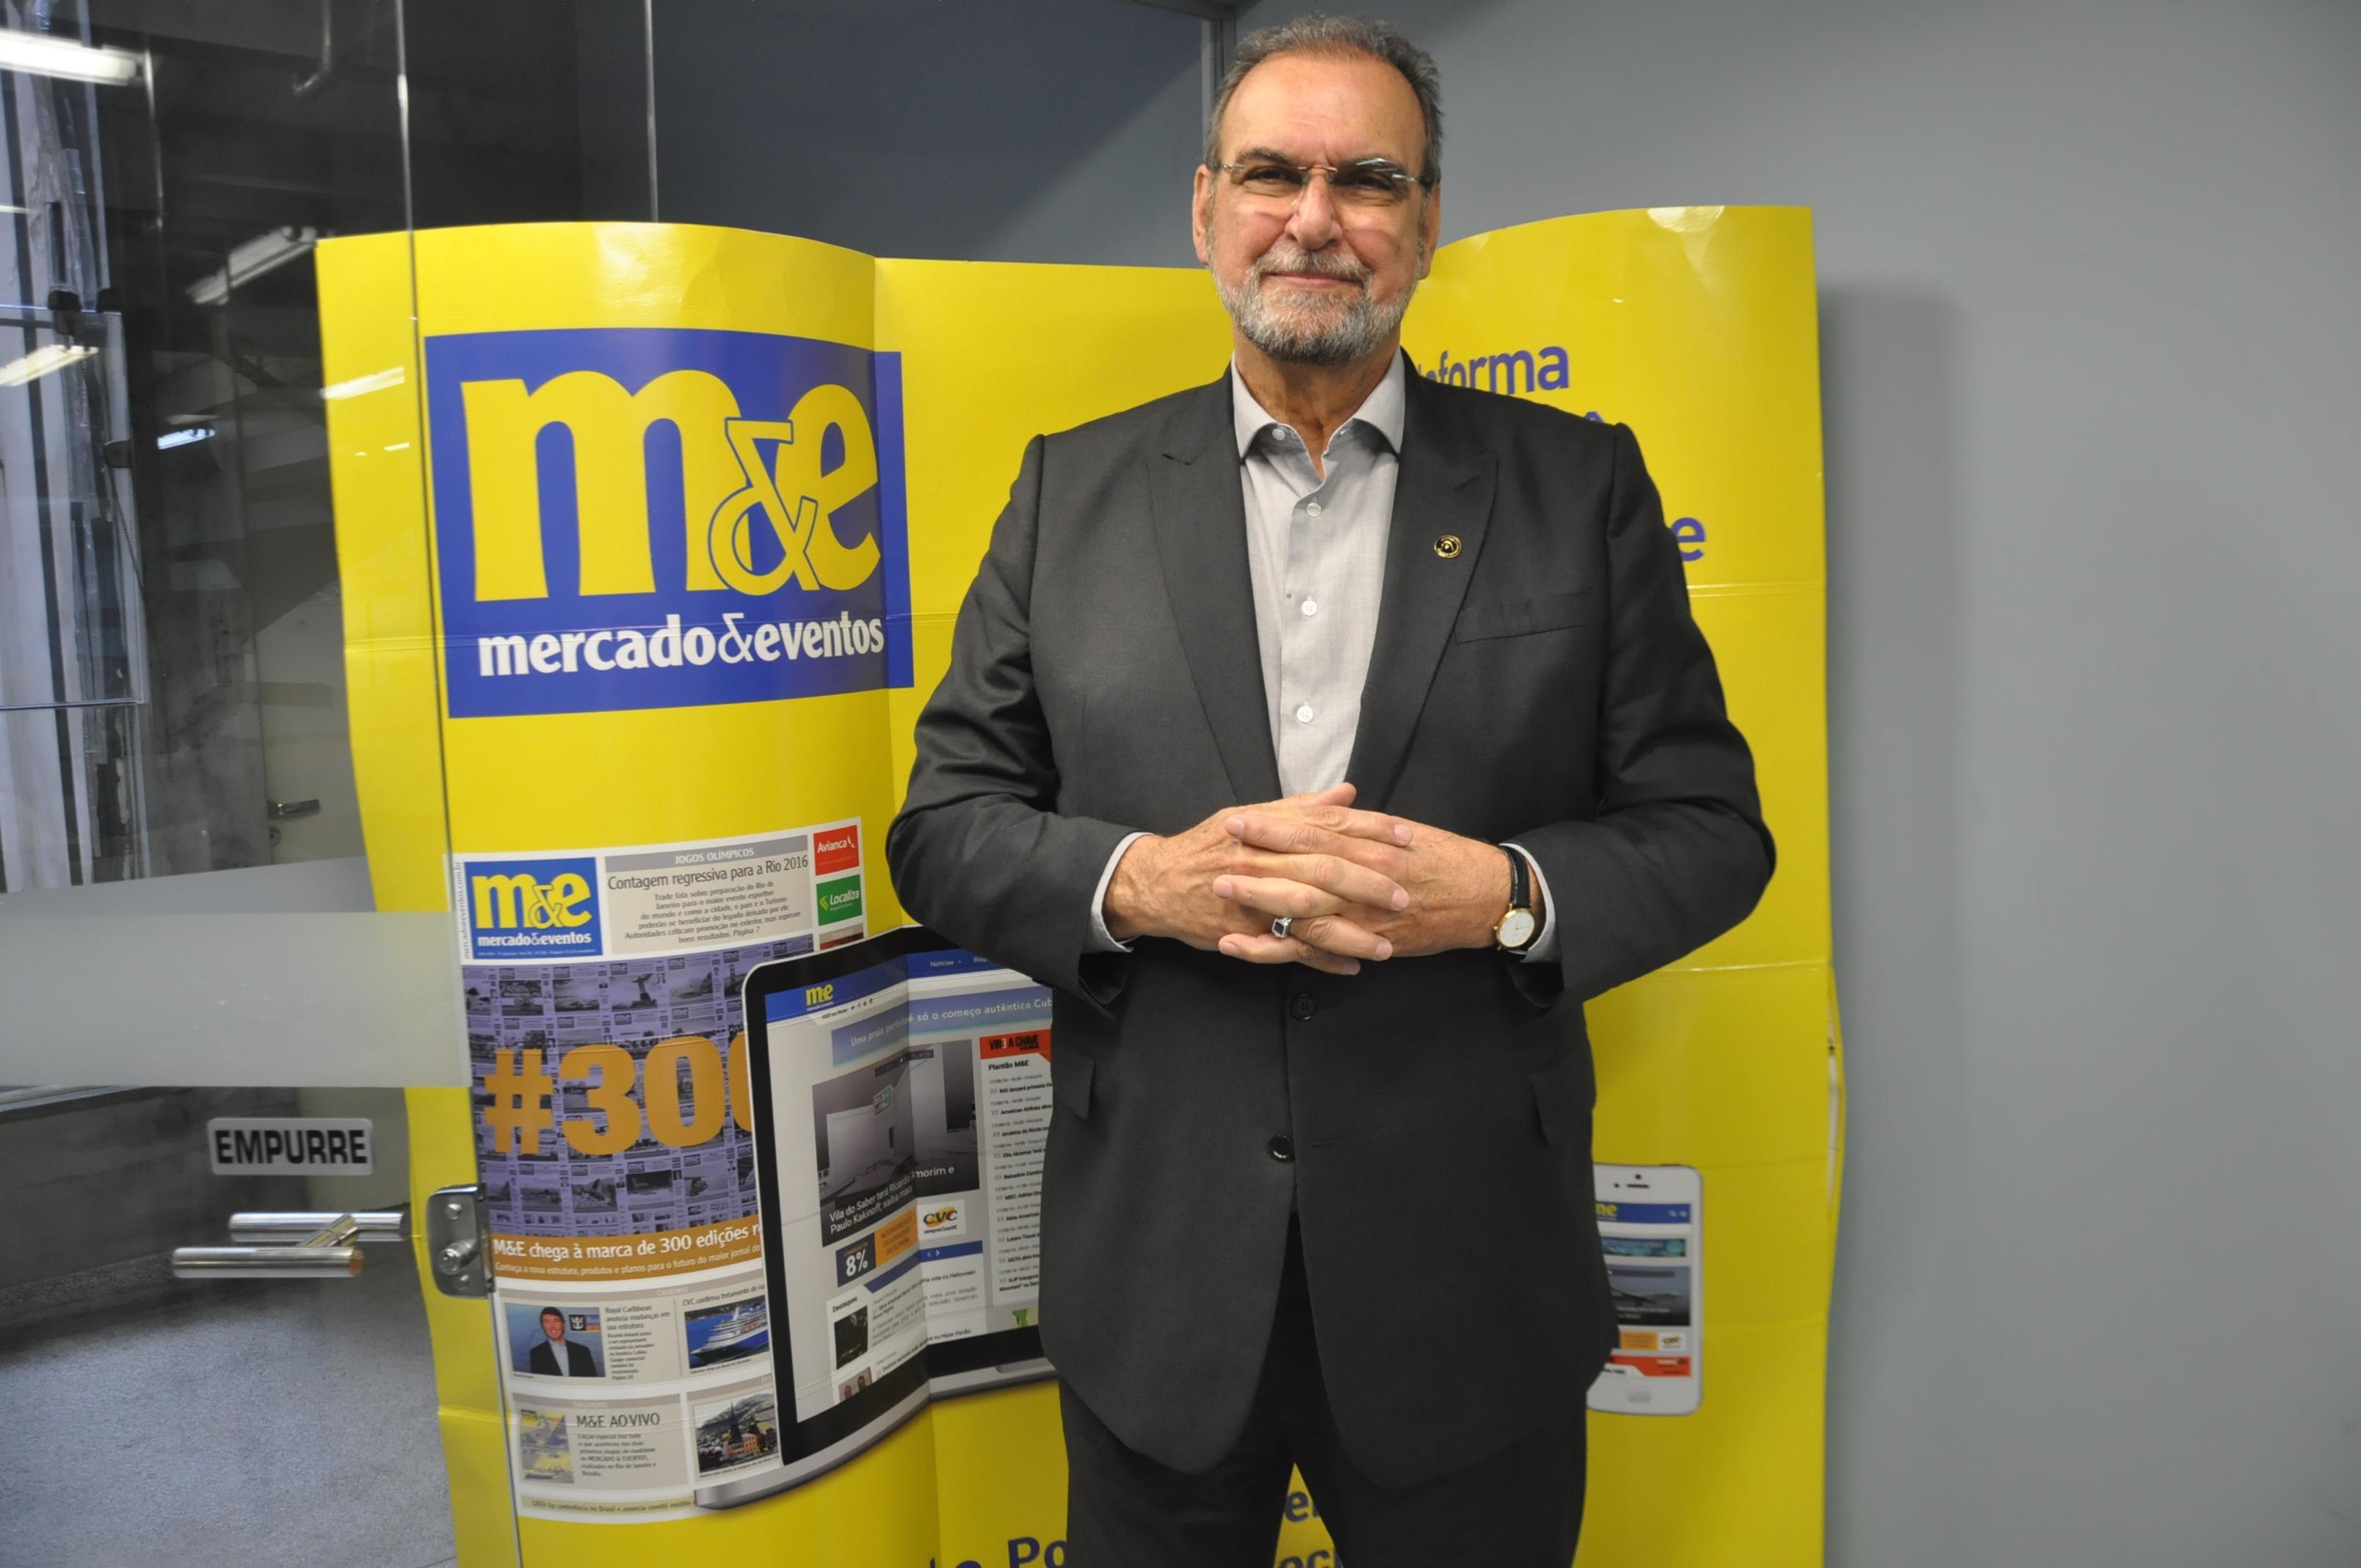 Ibrahim Tahtouh, VP concierge da Abratus e Presidente da IT Mice